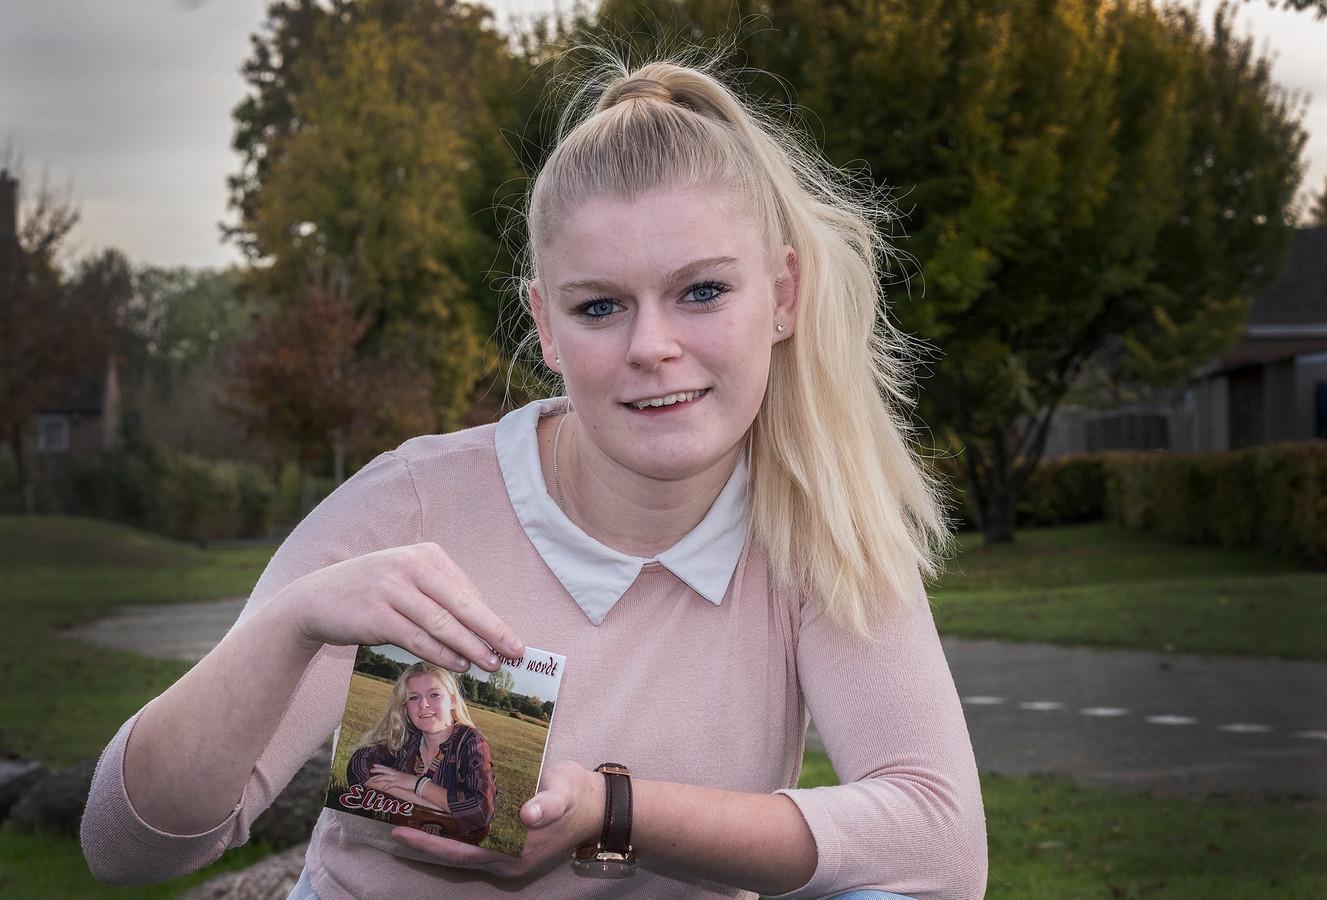 Zangeres Eline Visser uit Groesbeek met haar nieuwe CD.